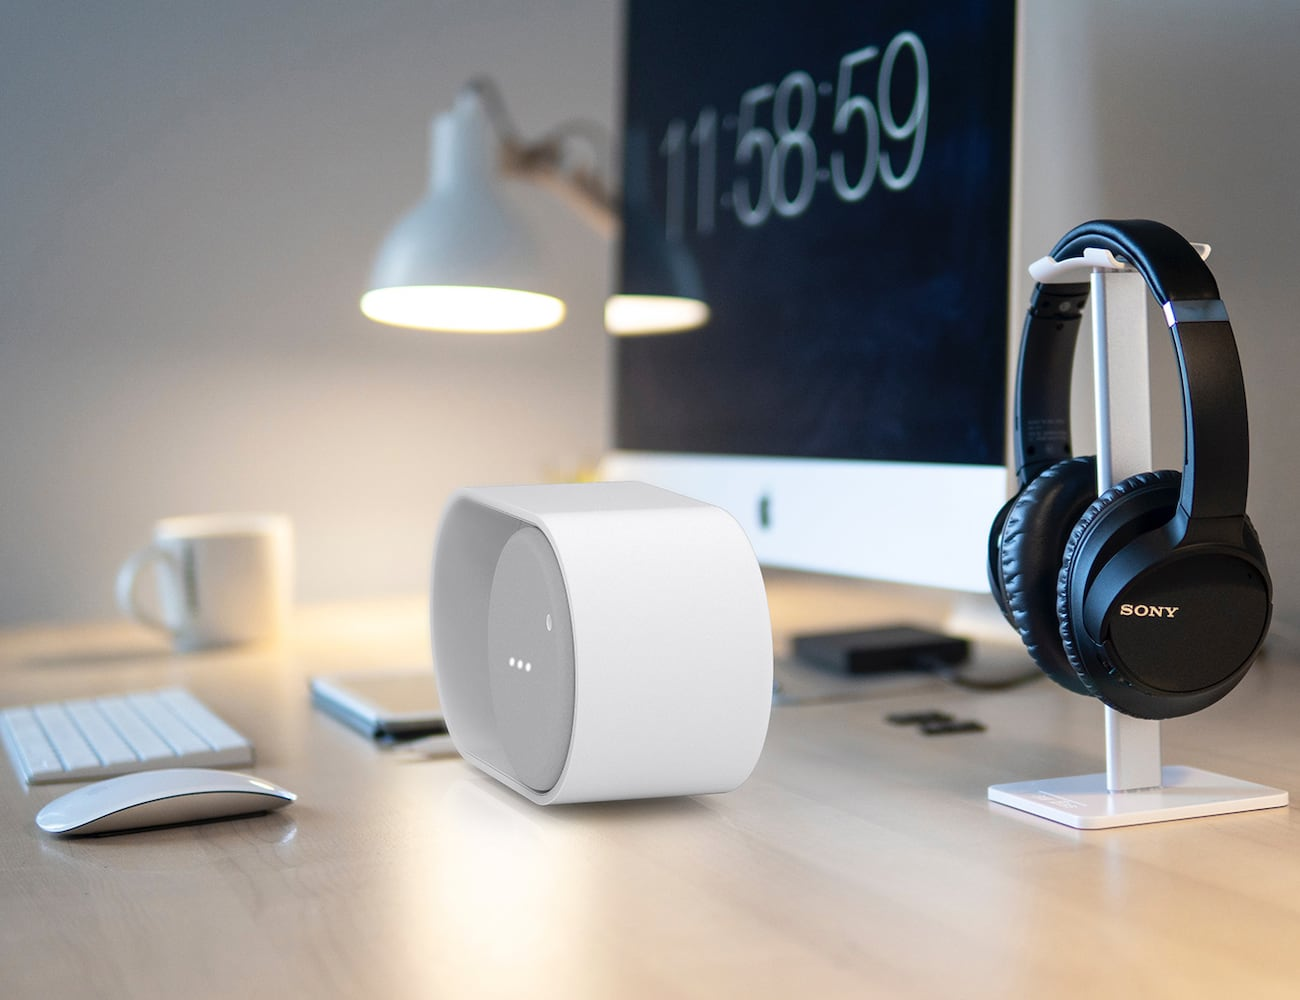 ON/OFF Smartphone Button Bluetooth Speaker imitates your digital display